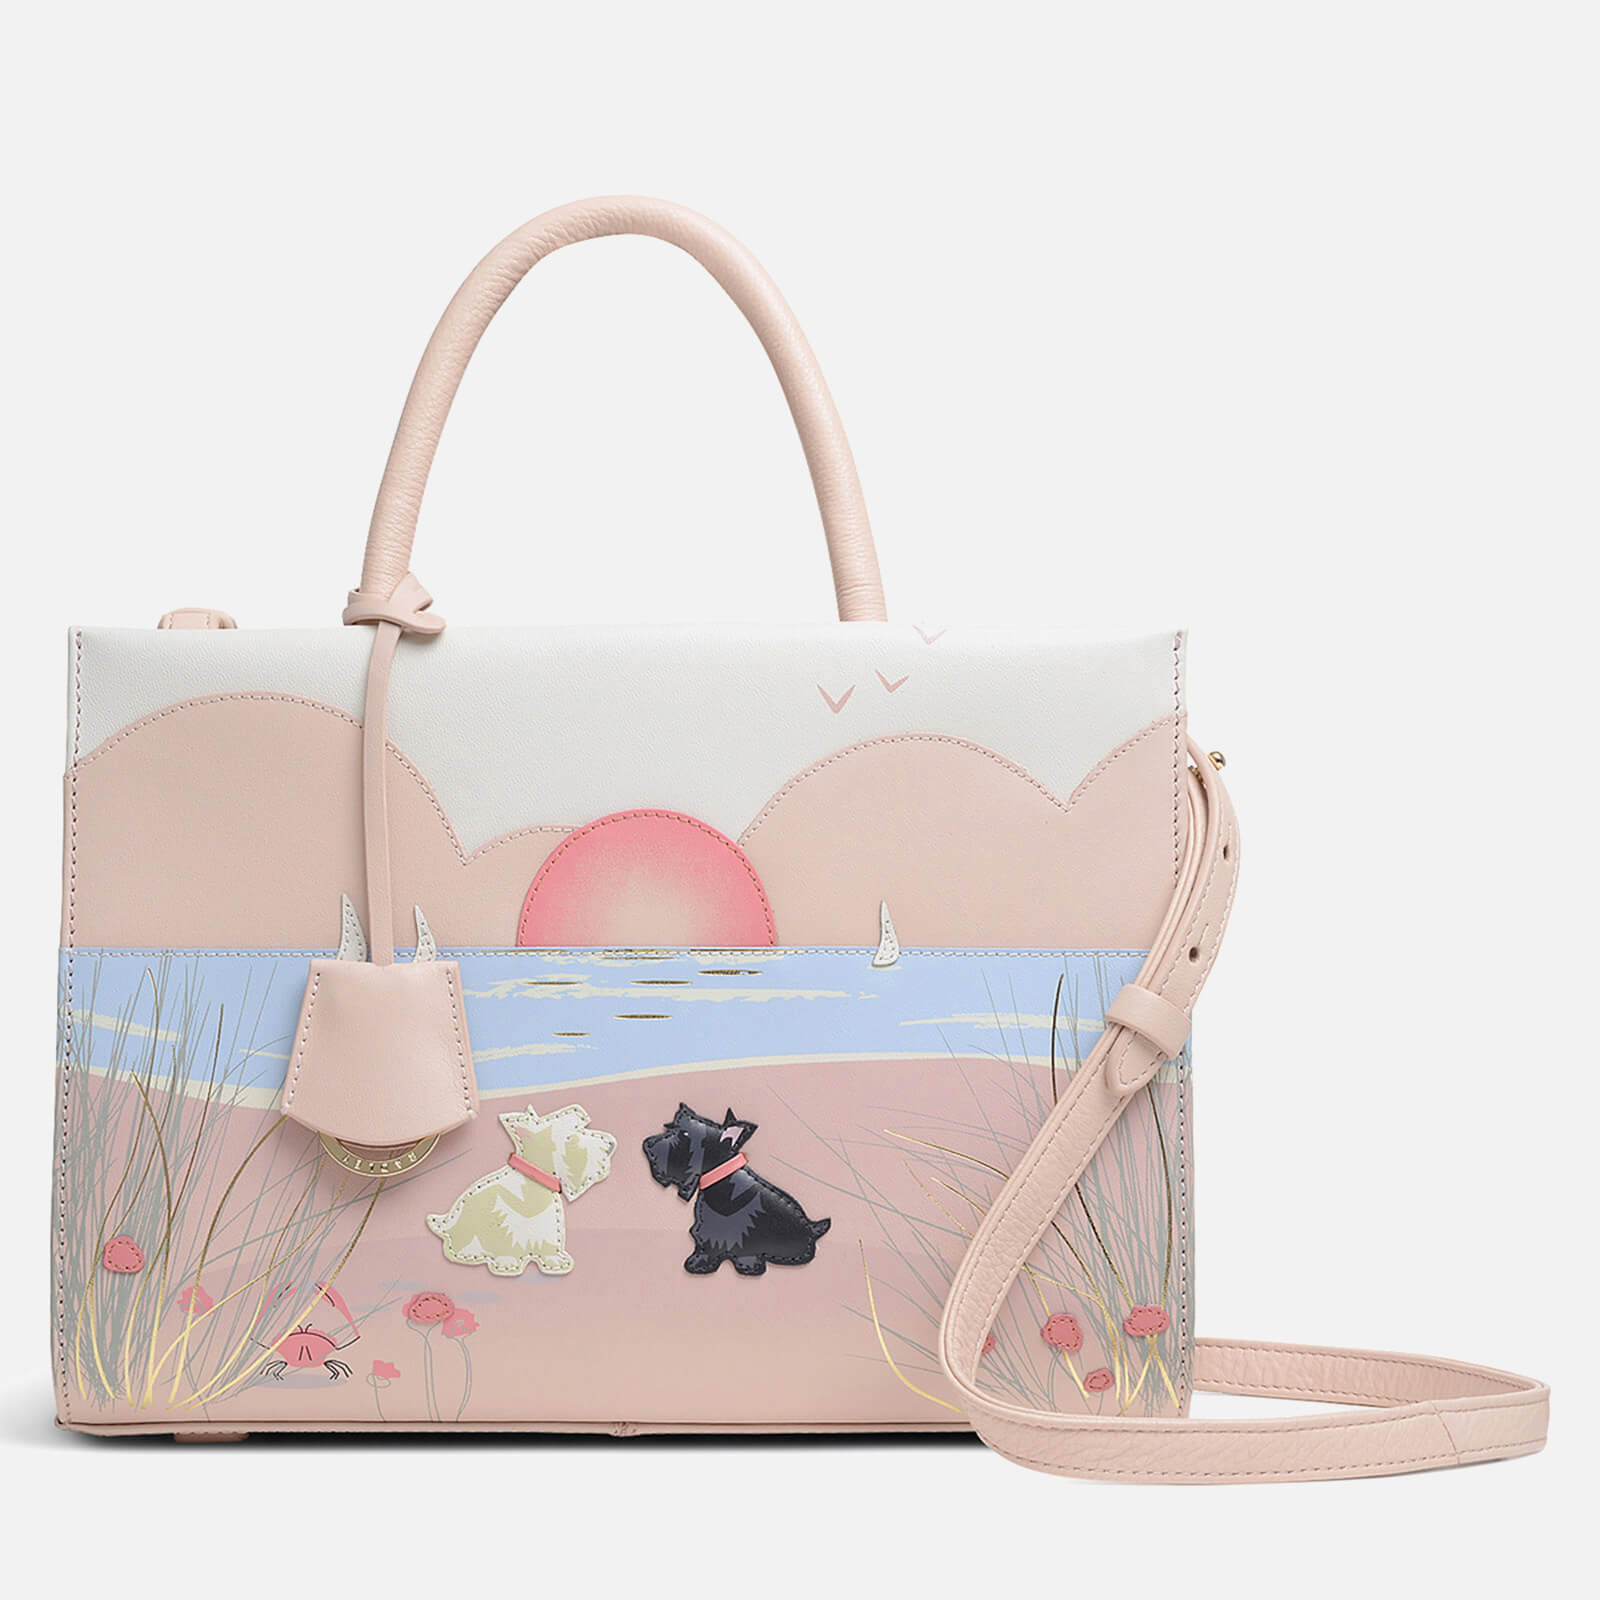 Radley Women's Burgh Island Medium Ziptop Multiway Bag - Blush